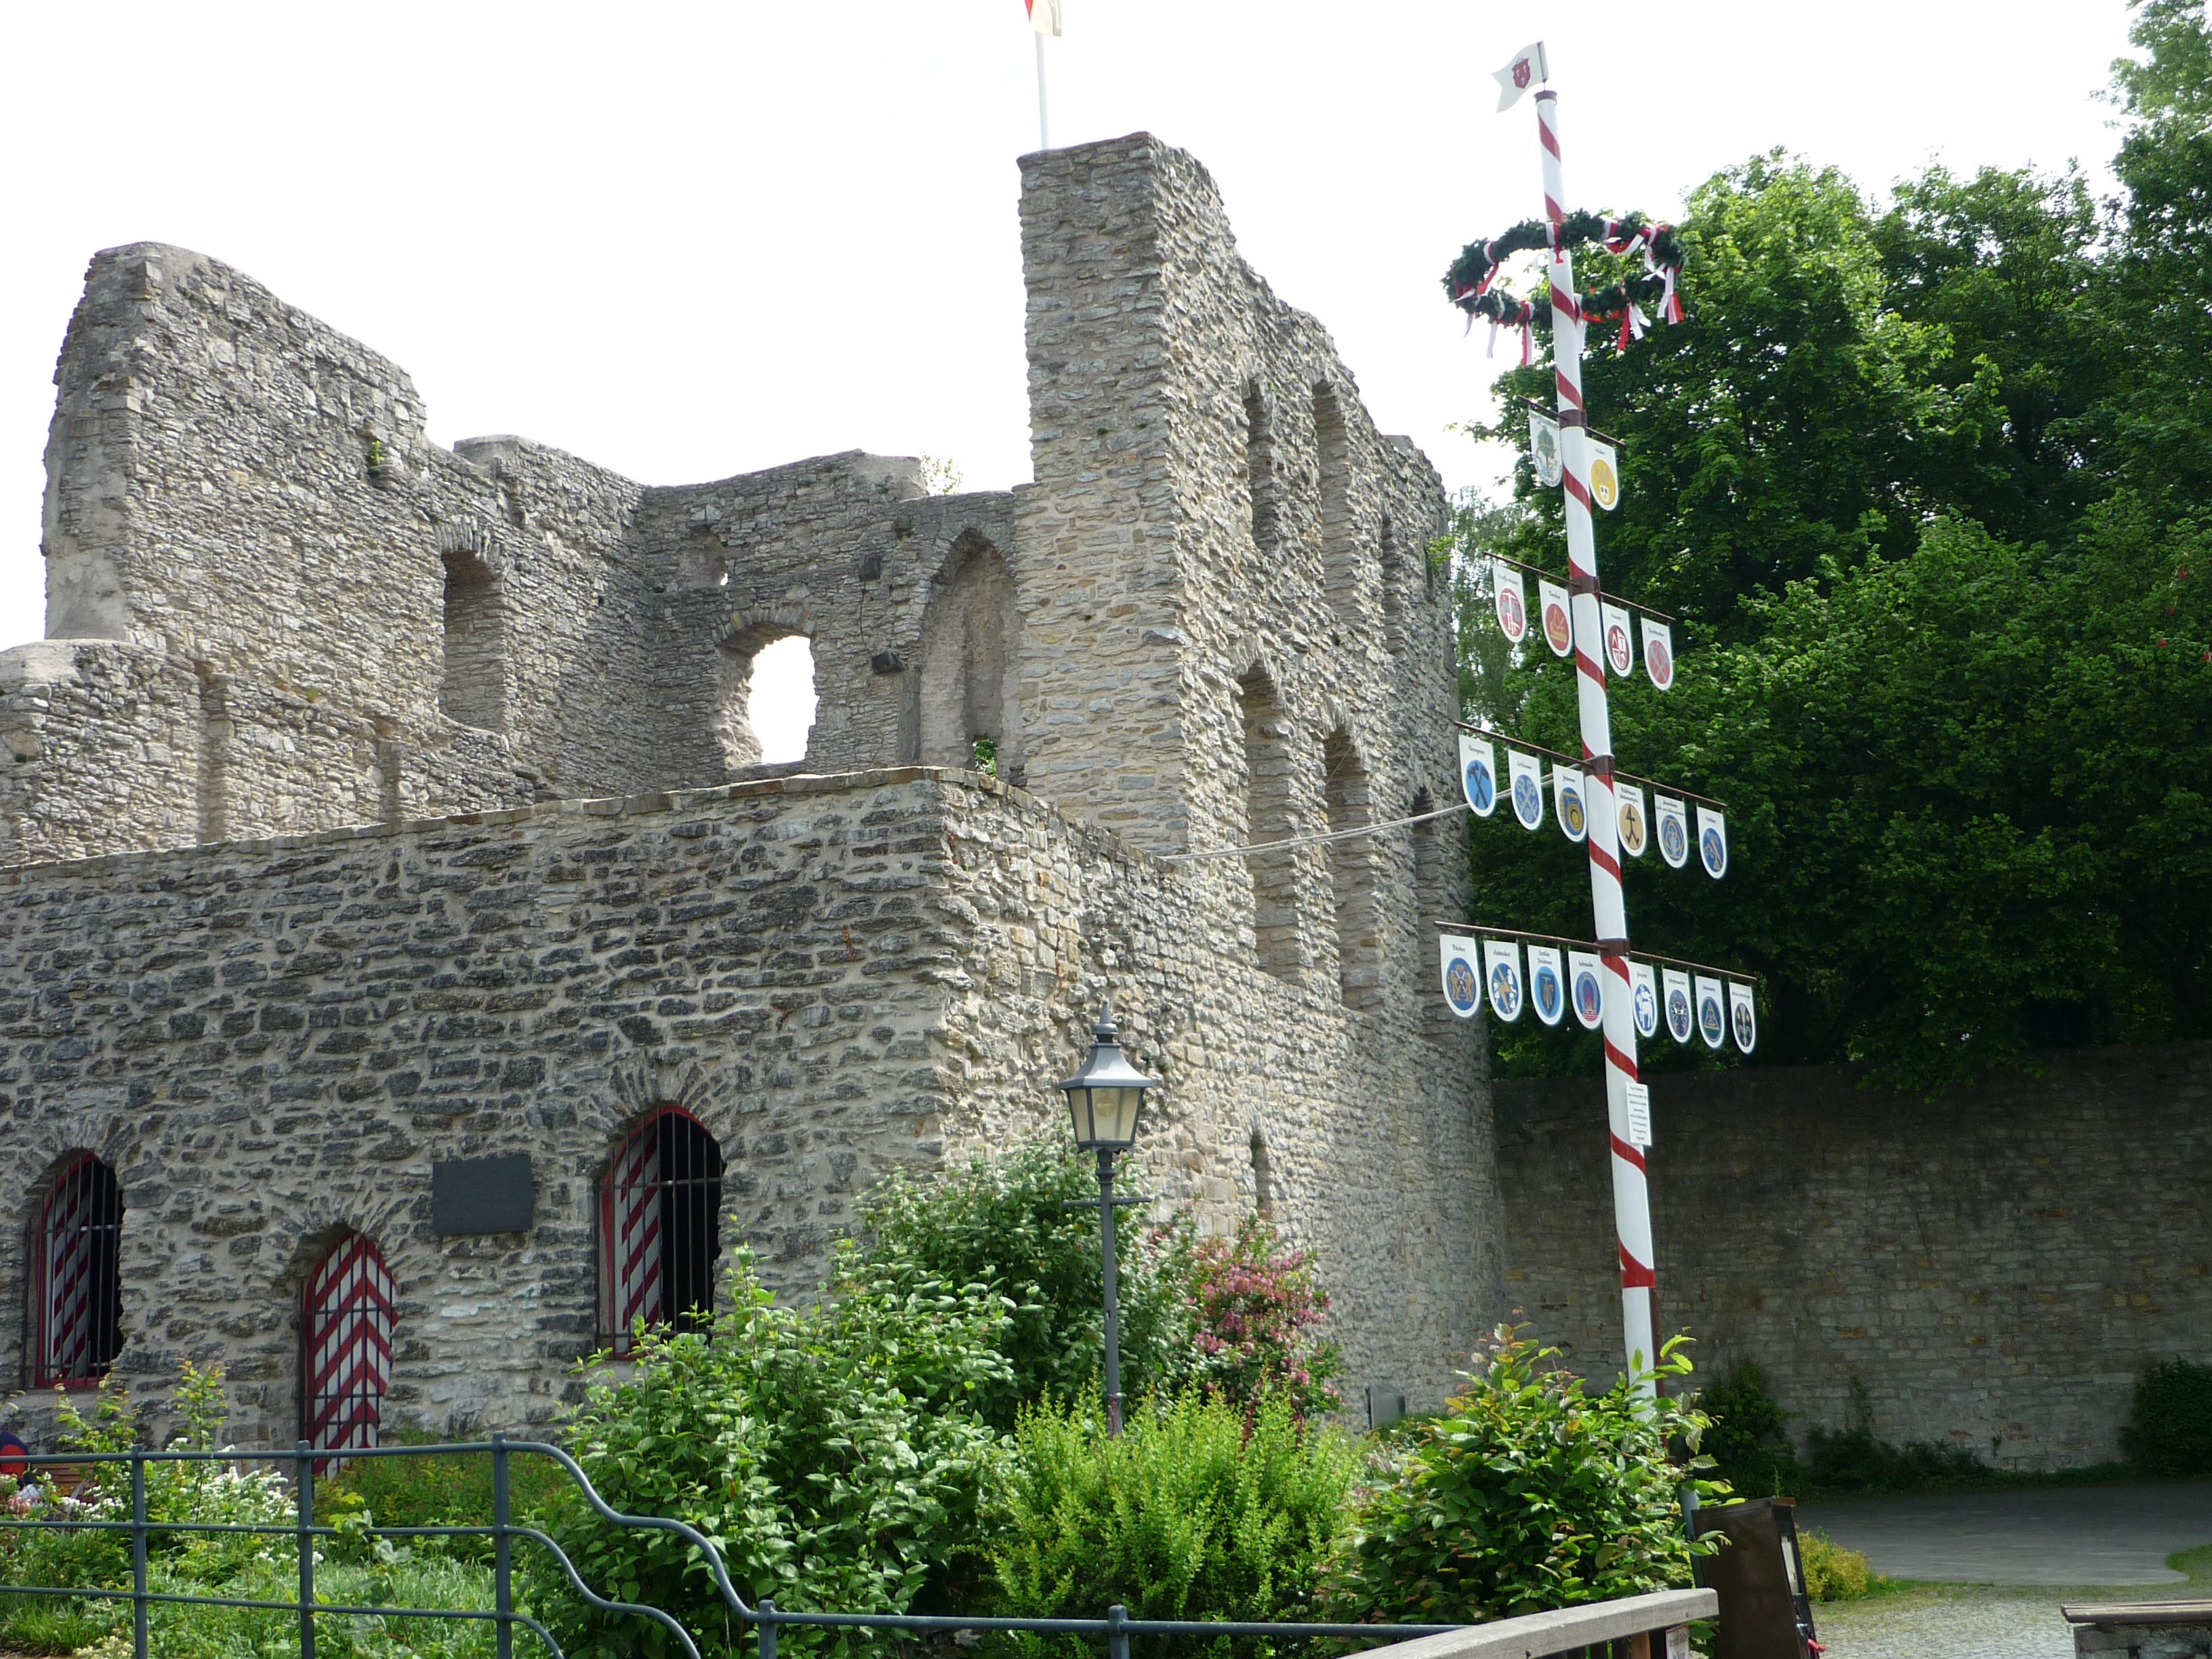 Burgruine Bad Lippspringe